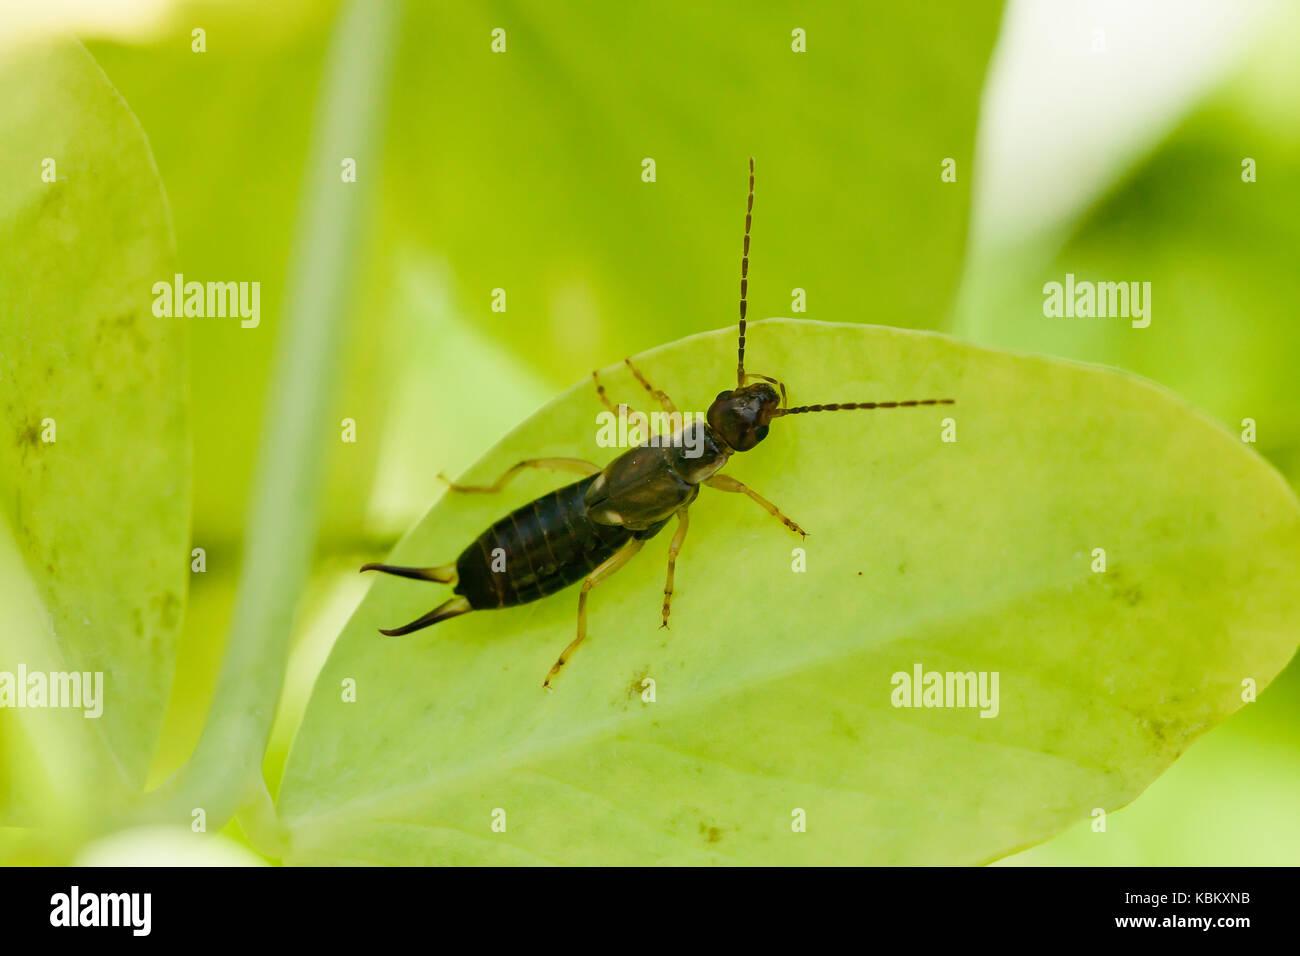 Common earwig bug, aka pincher bug on leaf (Forficula auricularia) - USA - Stock Image